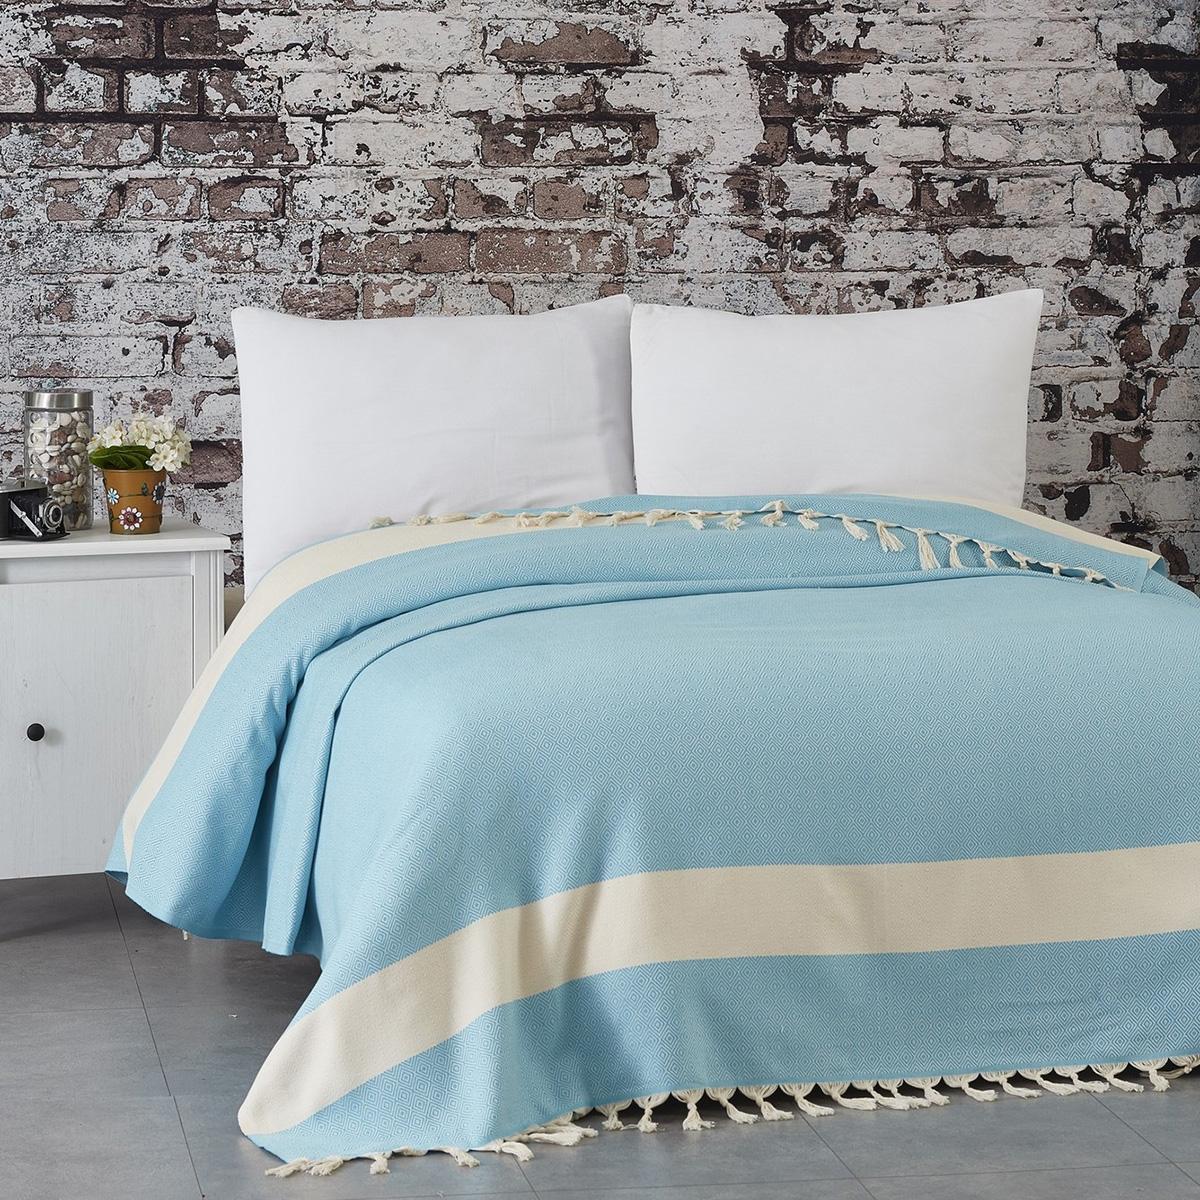 Одеяло Elmasis 100% памук